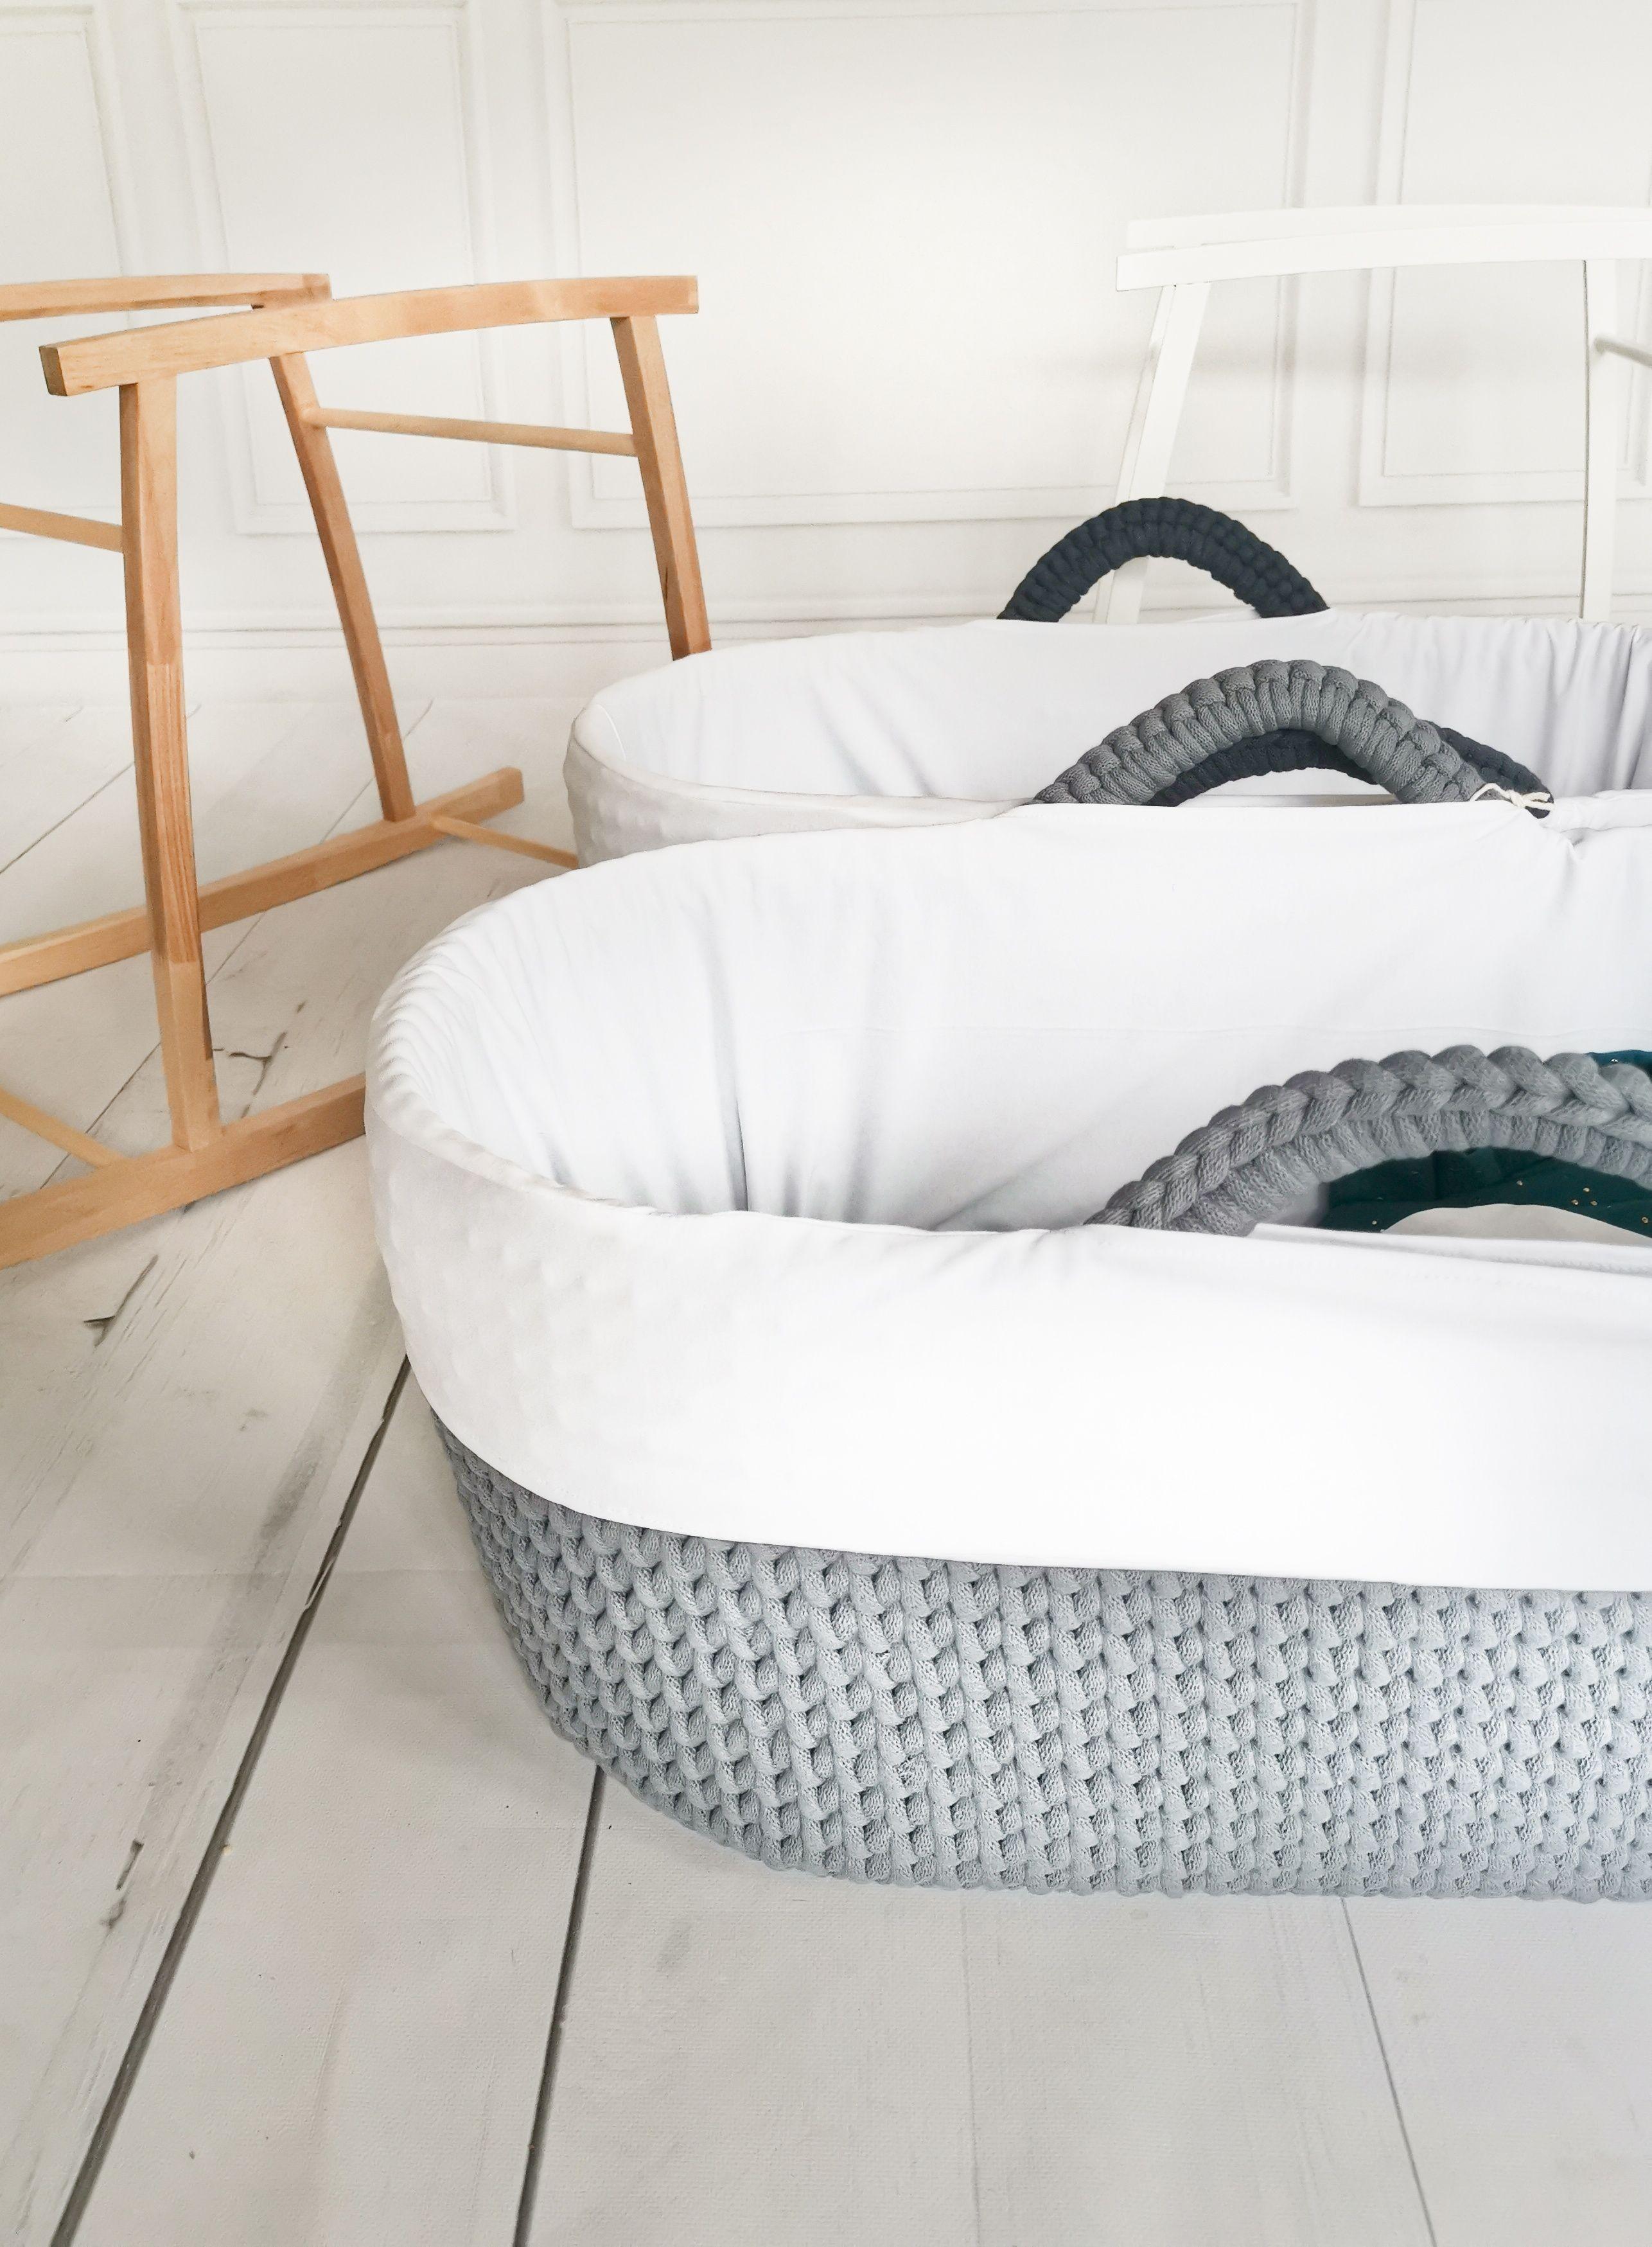 Moses Korb Stubenwagen Grosste Auswahl 1486 Minimidi Design In 2020 Kinder Mobel Stubenwagen Kinderbett